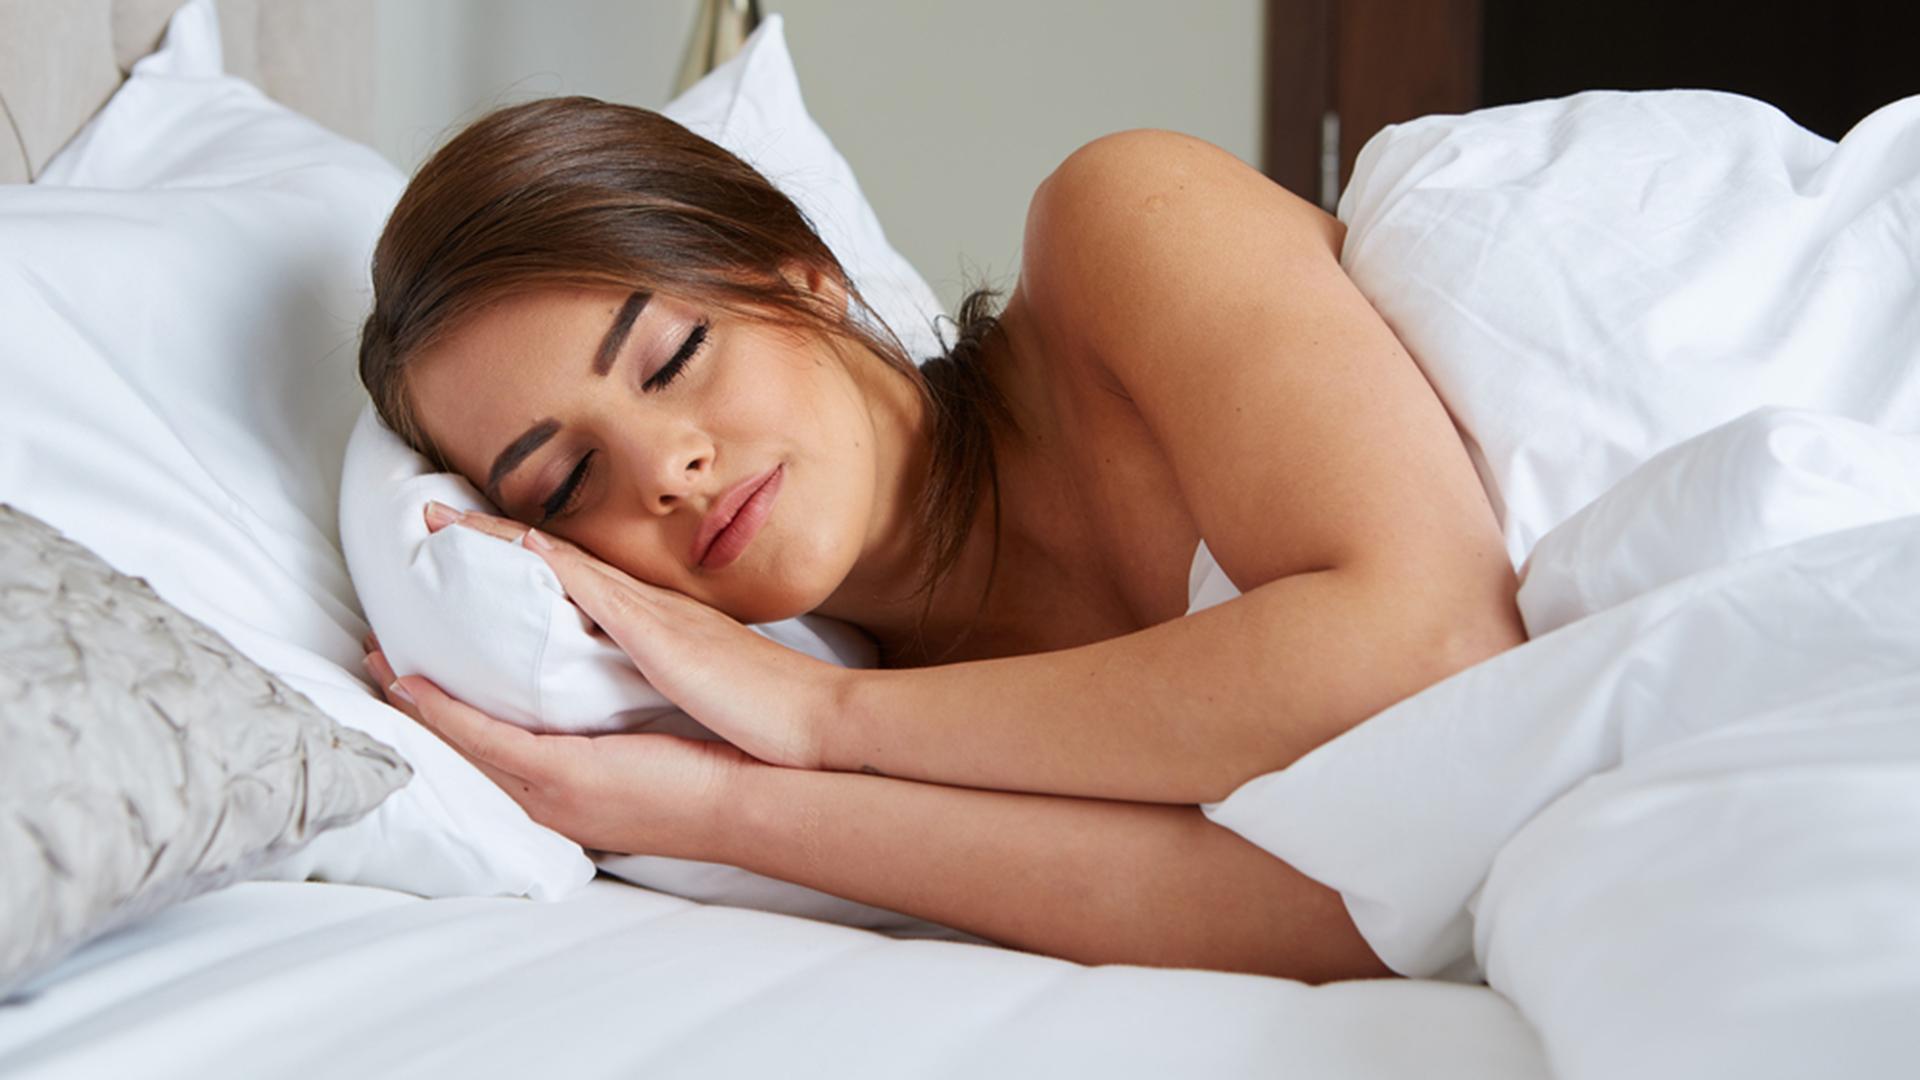 Rani odlazak na spavanje utiče na zdravlje, lepotu i raspoloženje